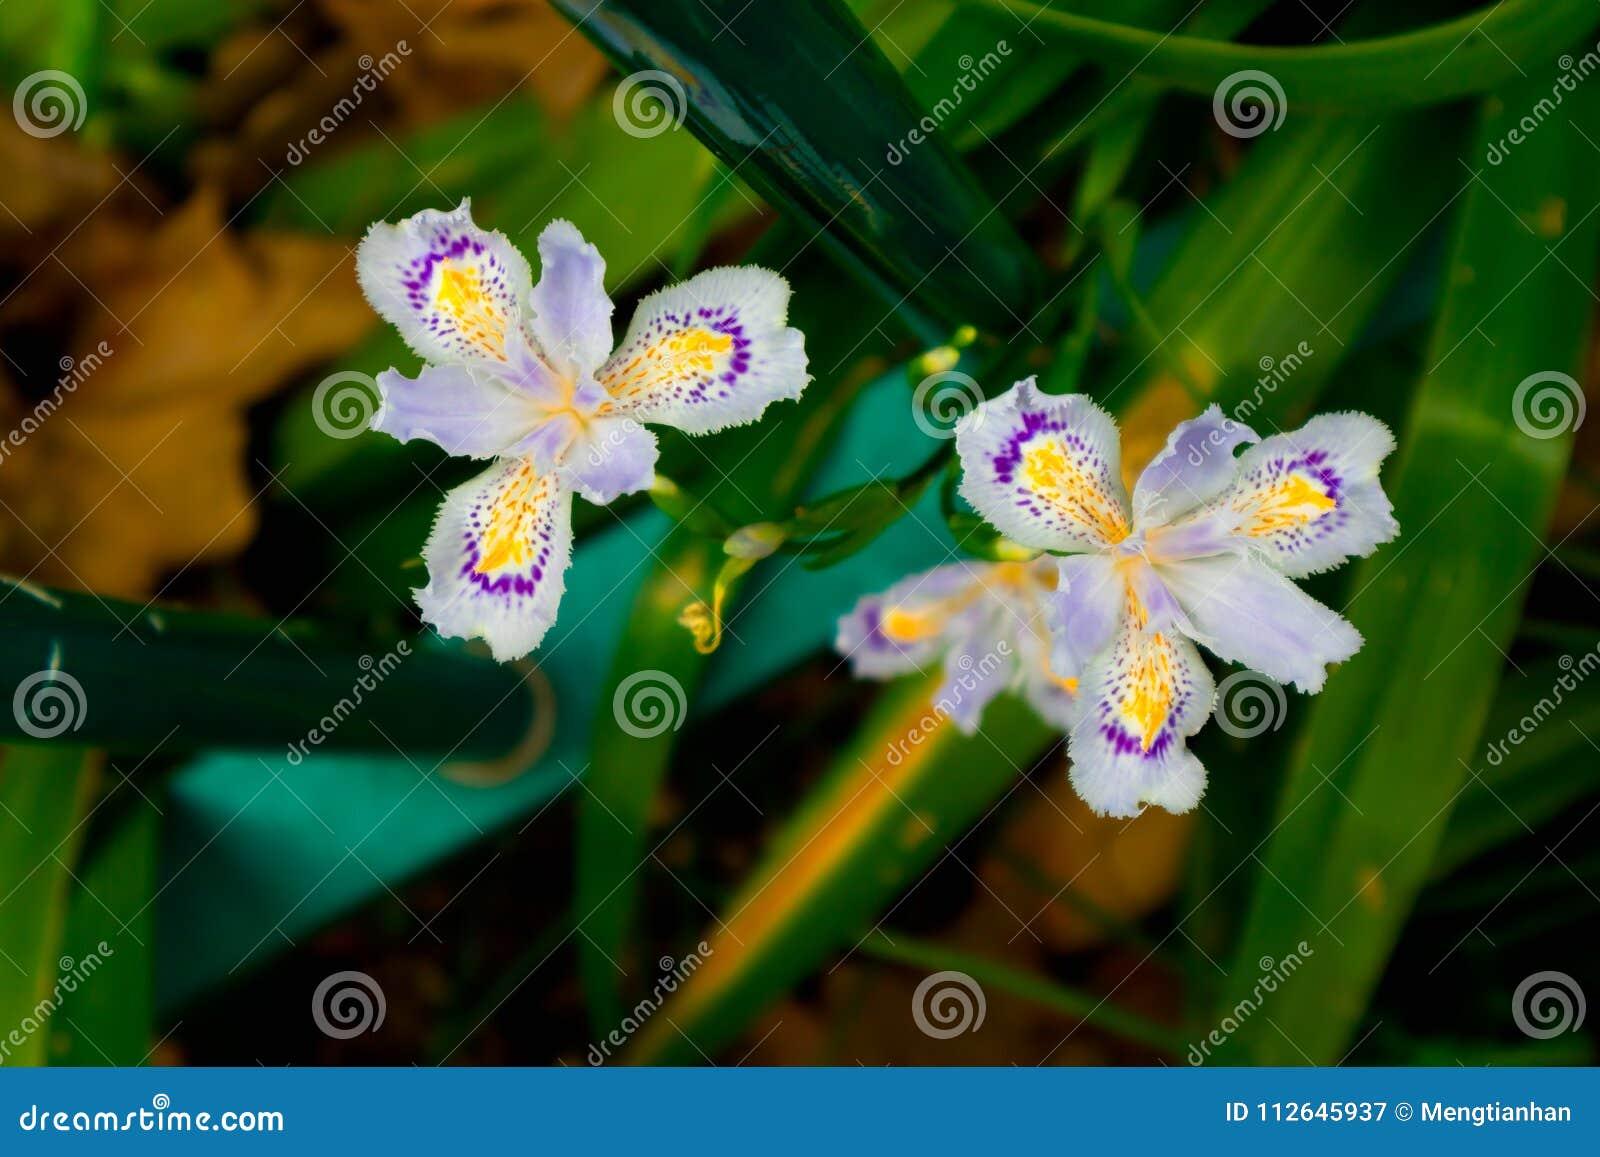 Iris Flower Perennial Herb Stock Image Image Of Deciduous 112645937